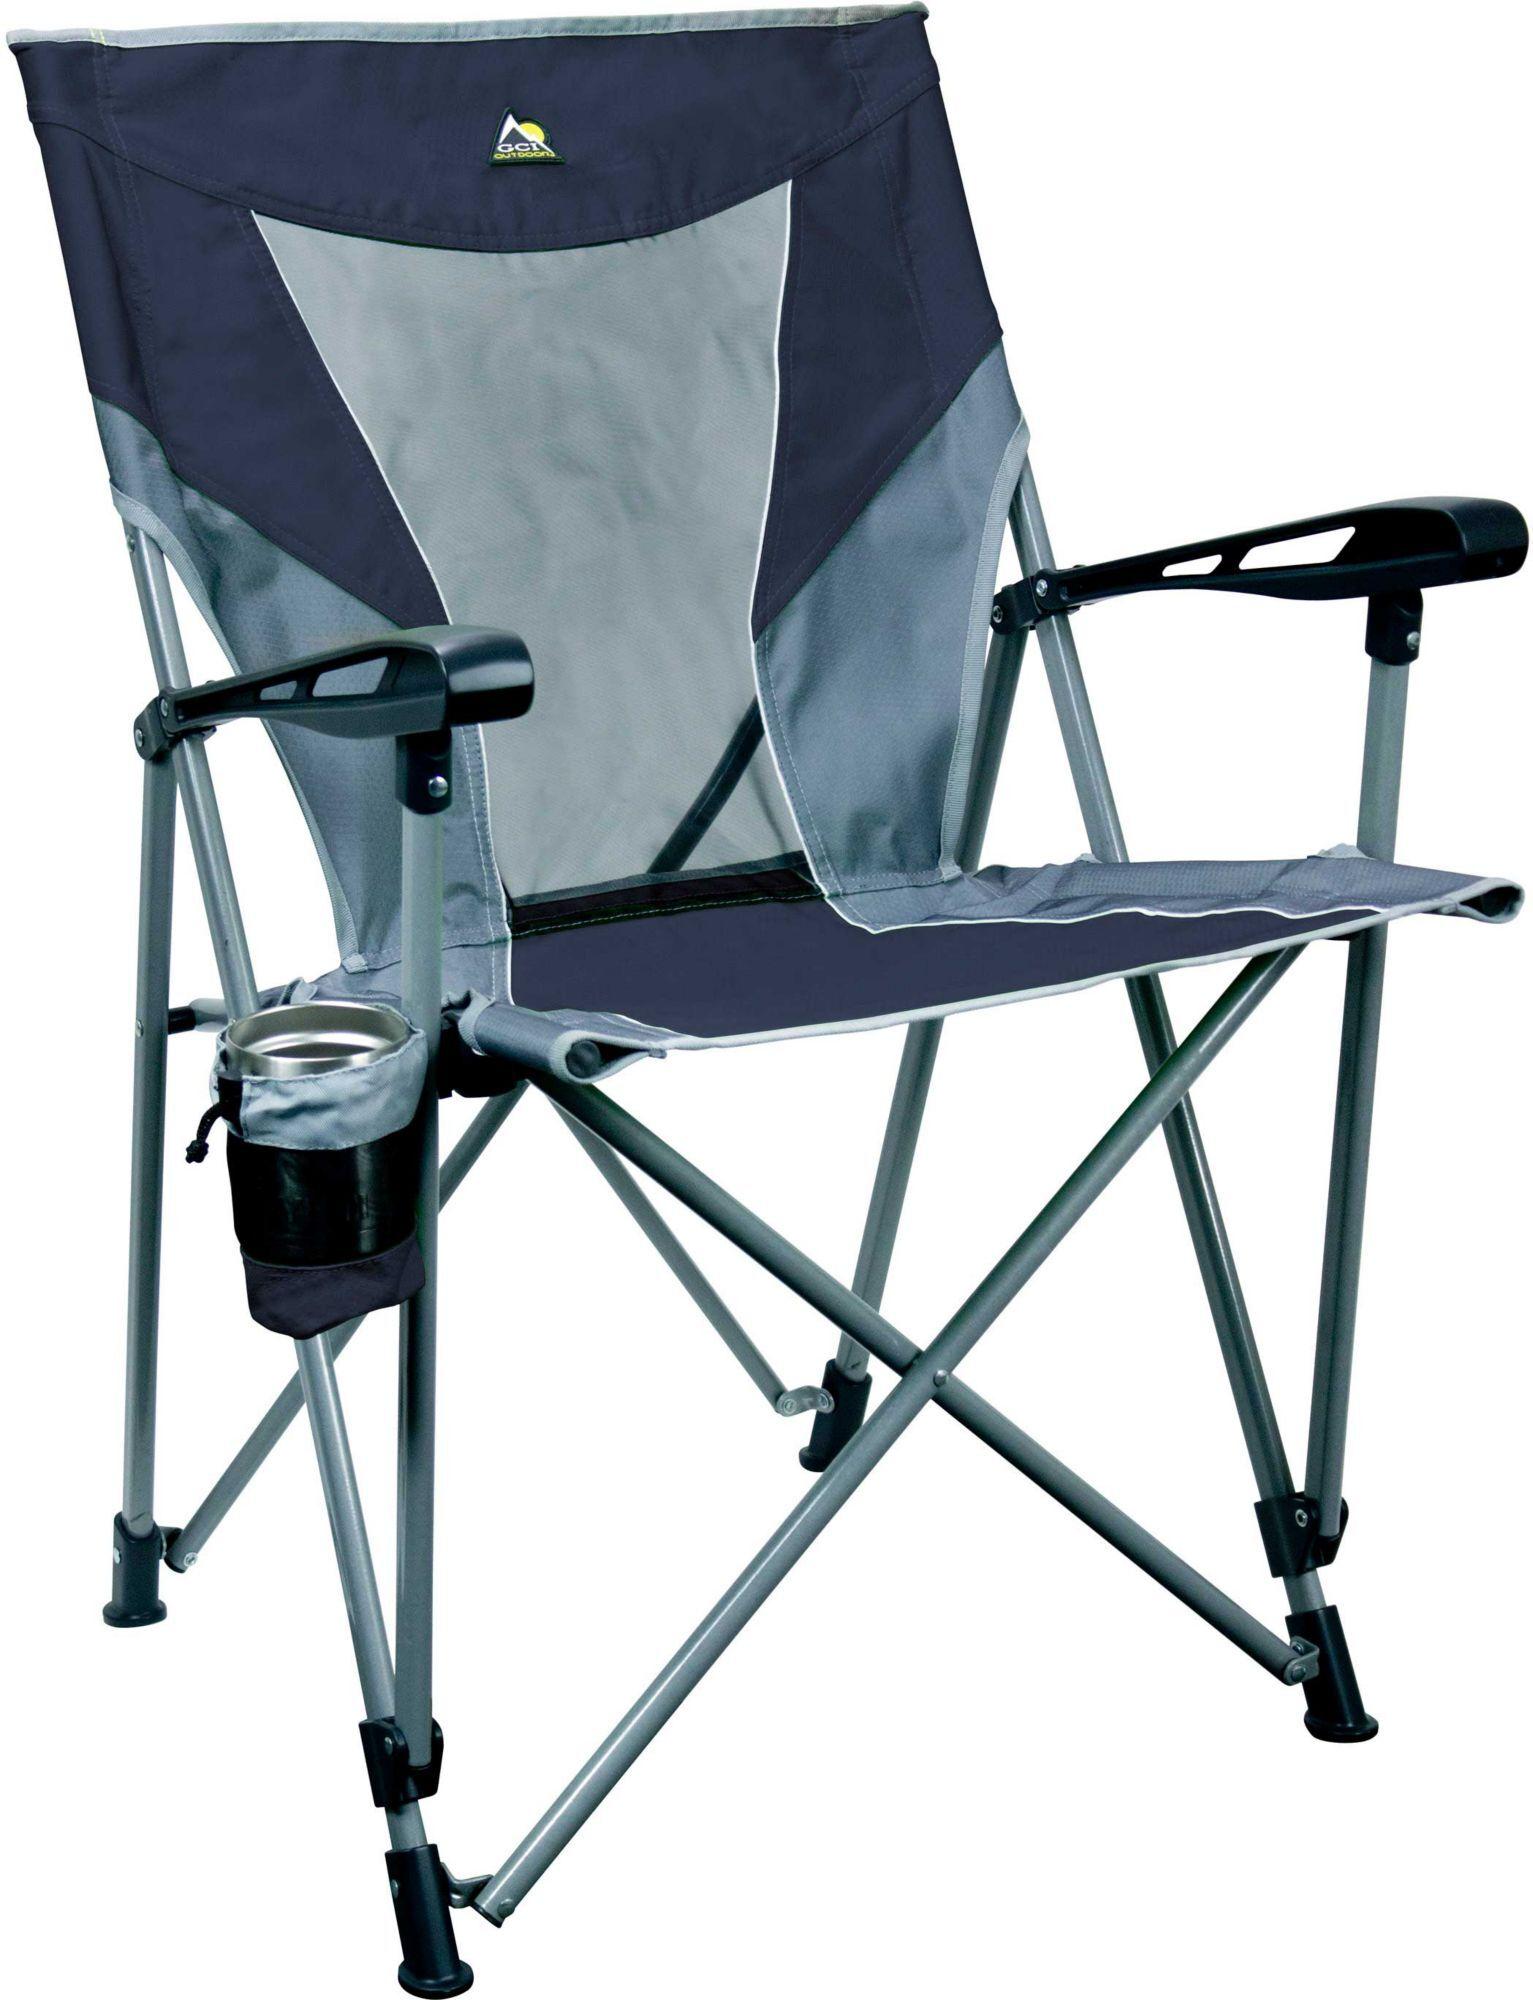 GCI Outdoor Sports Chair, Blue